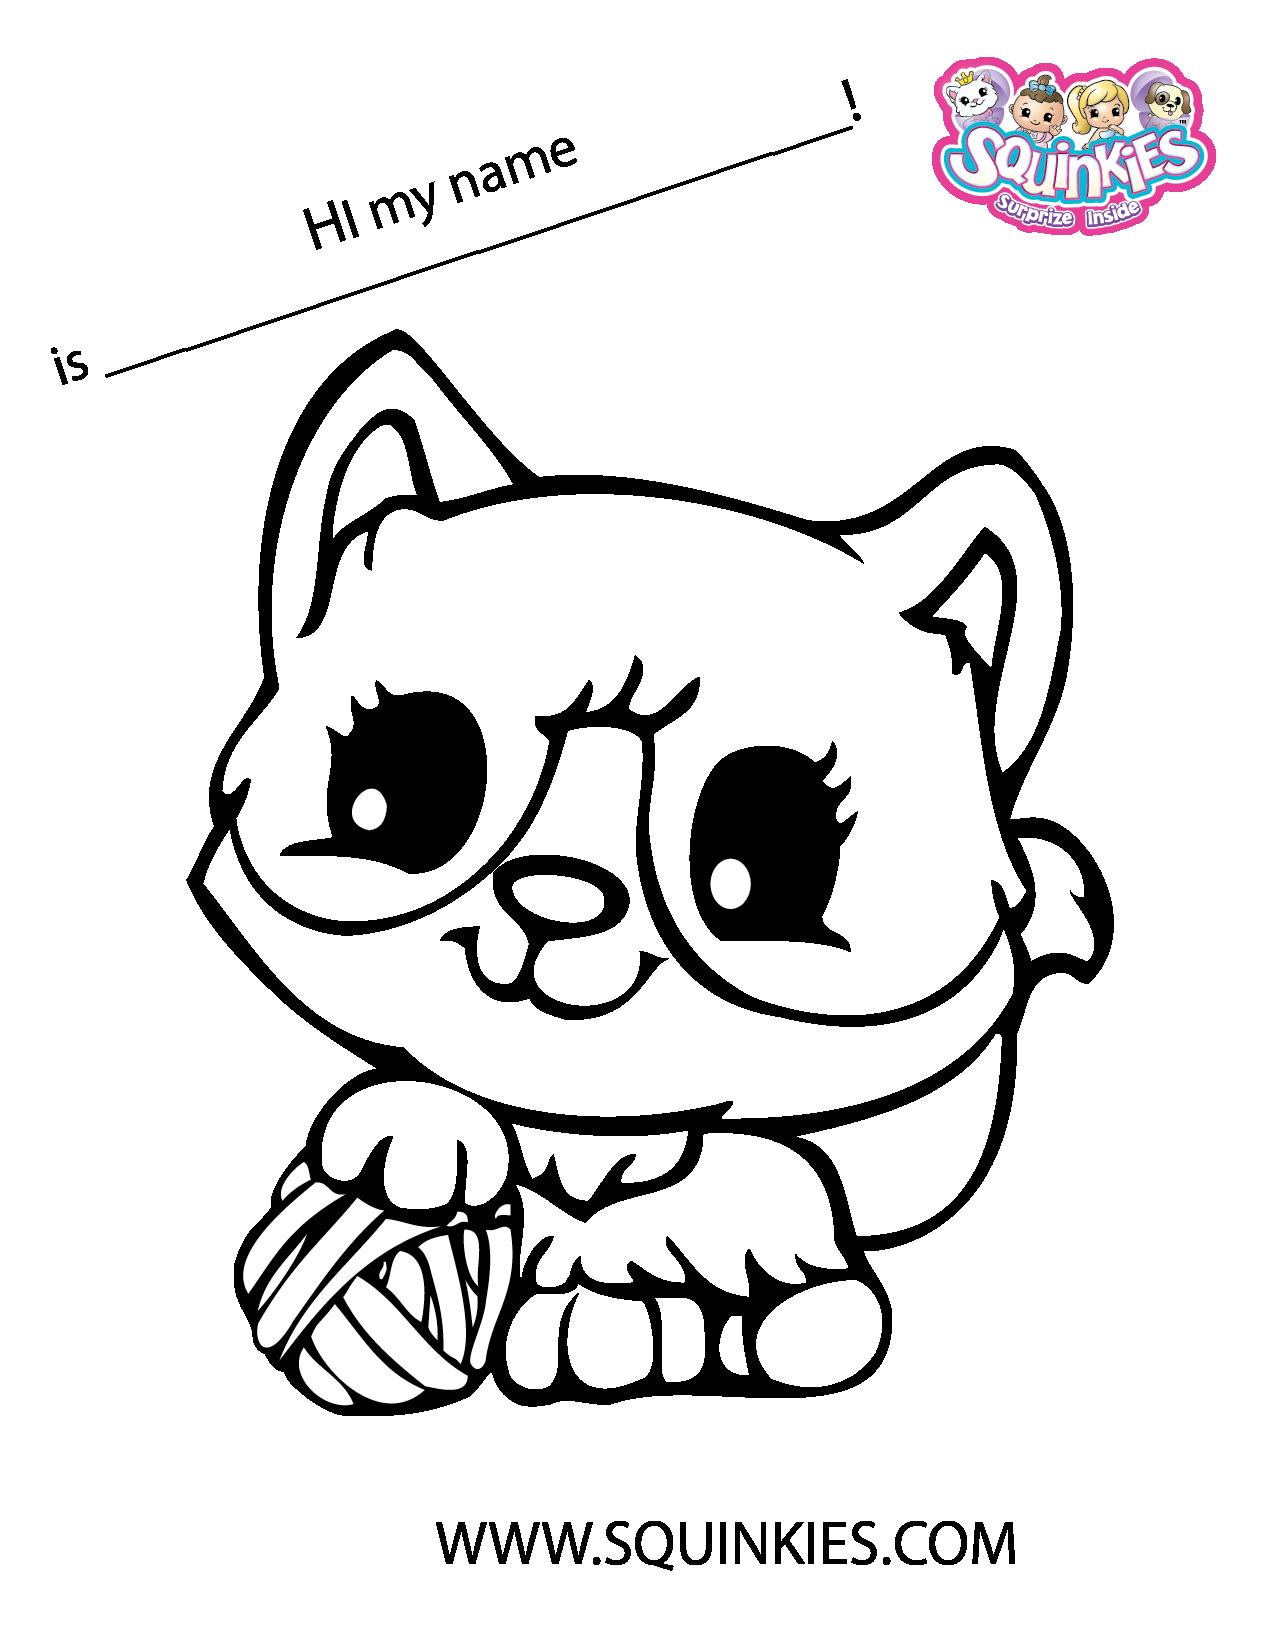 Squinkies Coloring Page! | Squinkies Activities | Pinterest